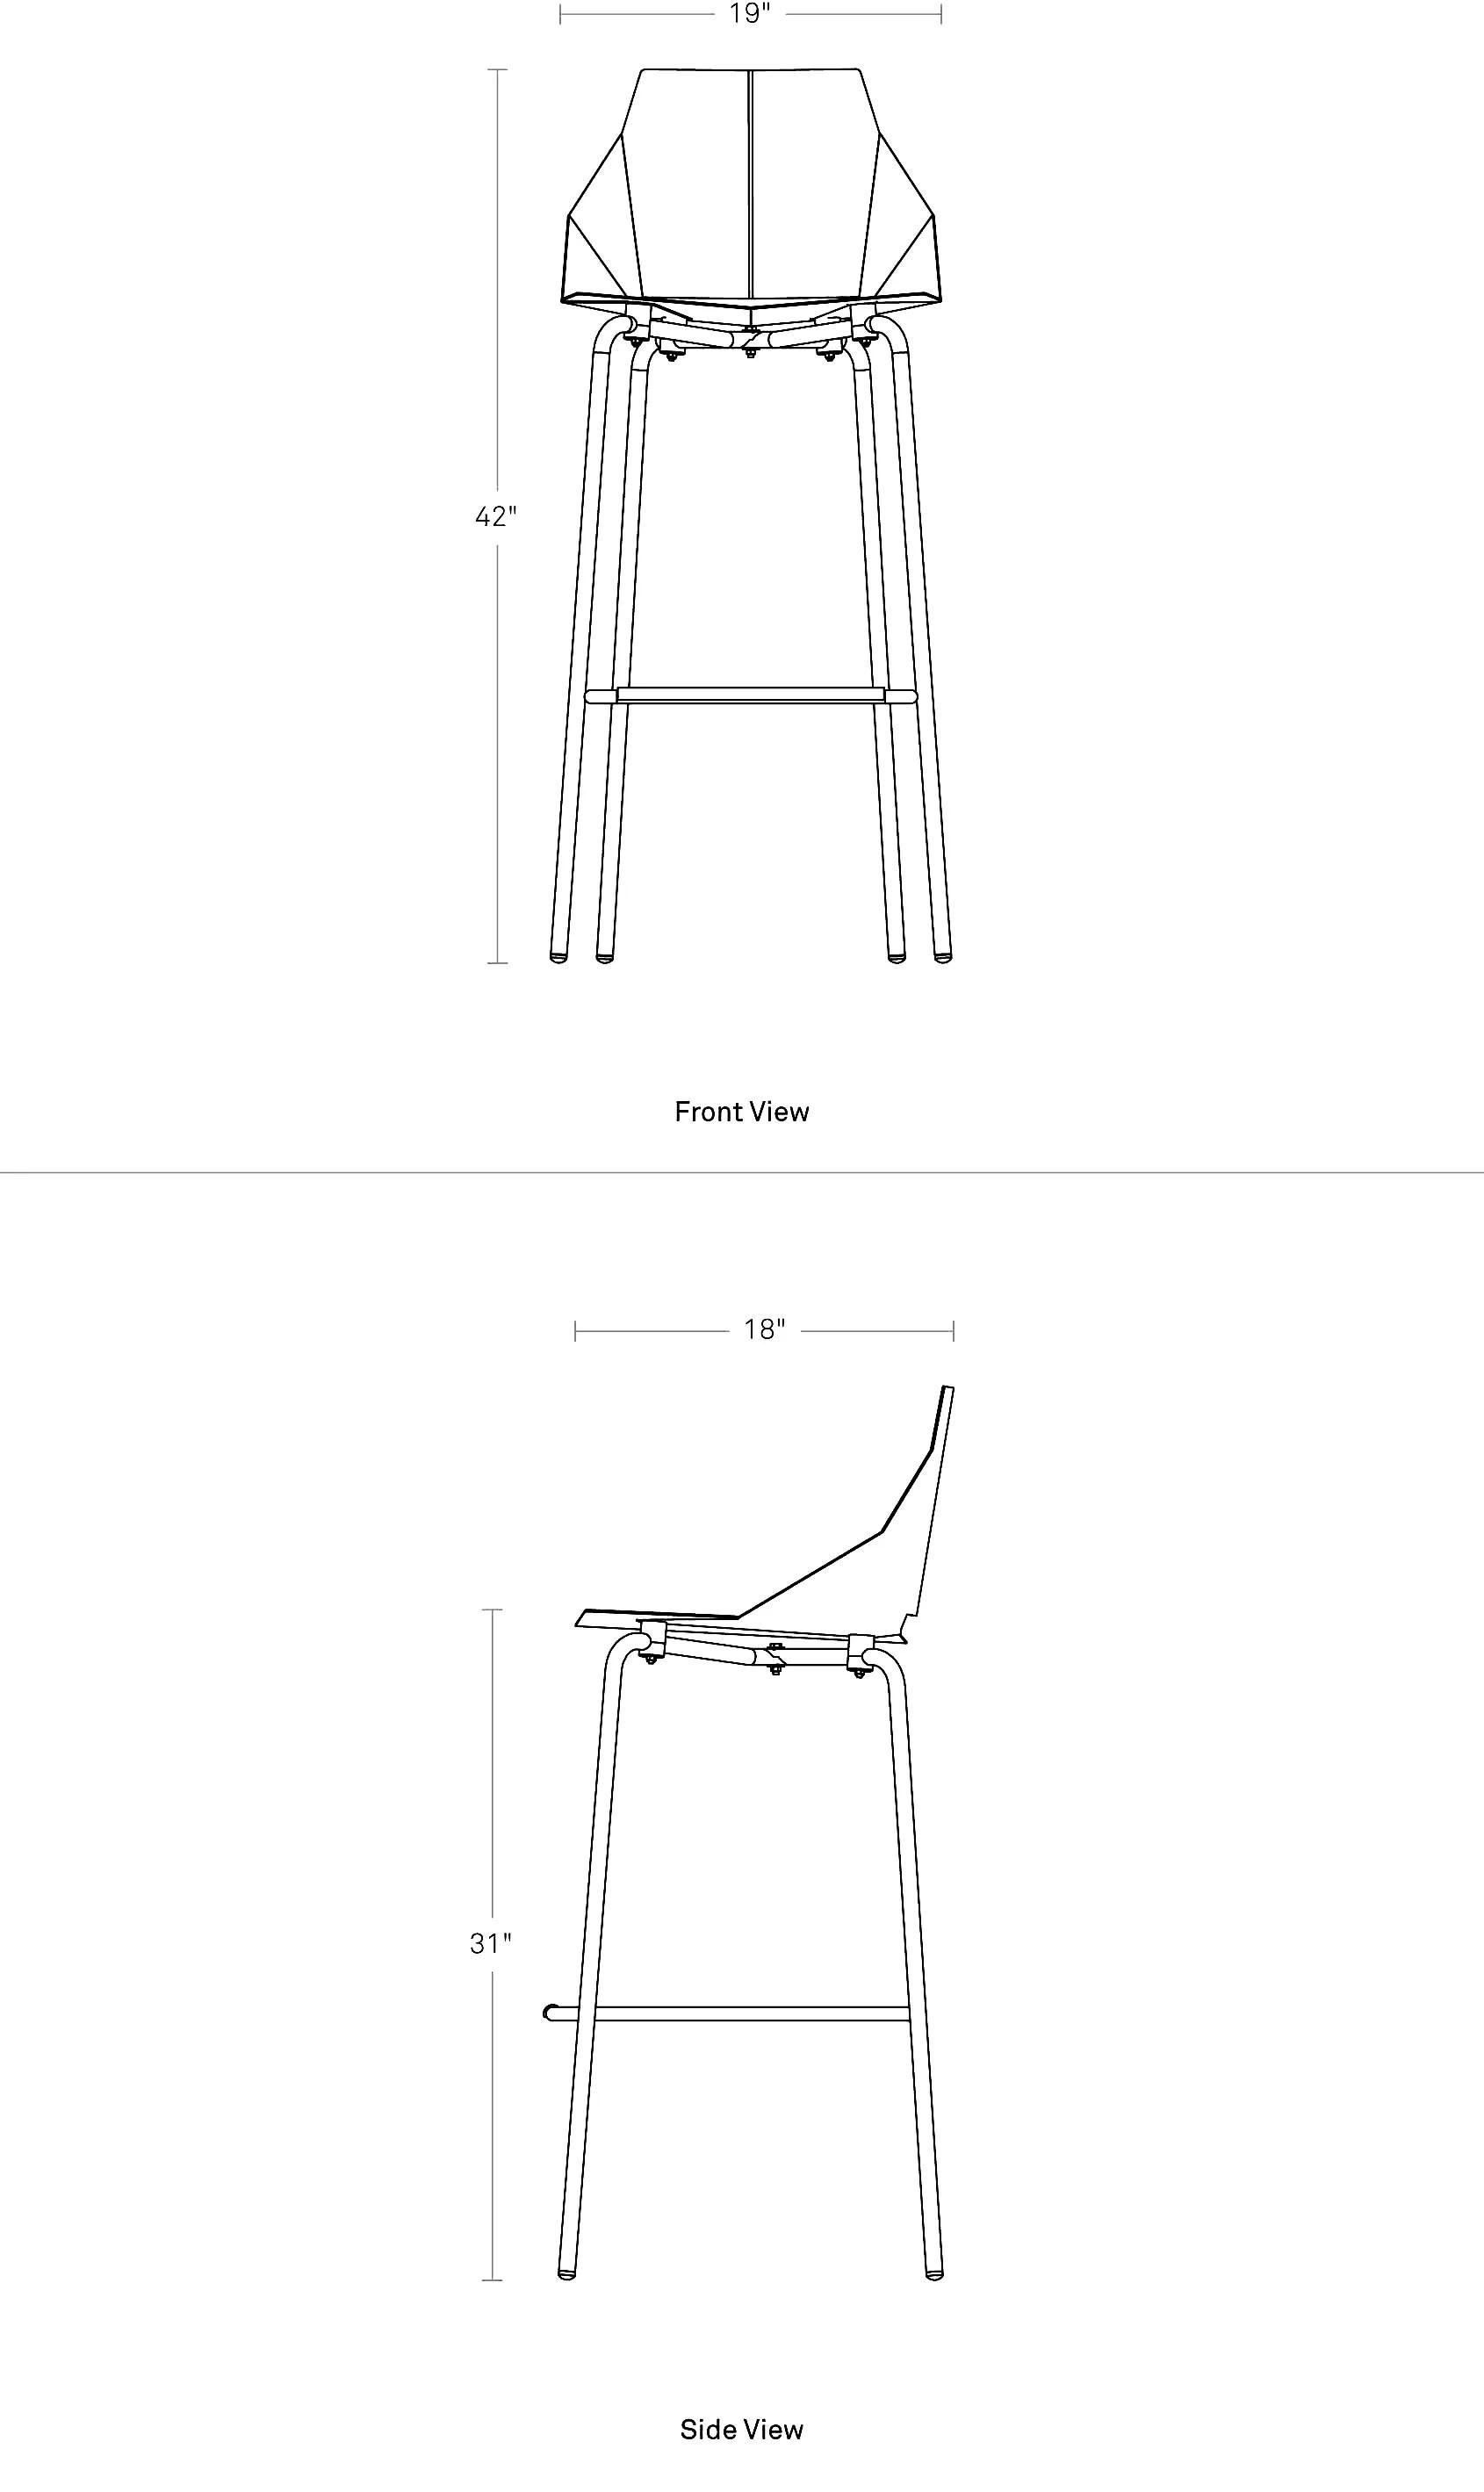 blu dot real good chair tiger print covers copper bar stool - modern stools  